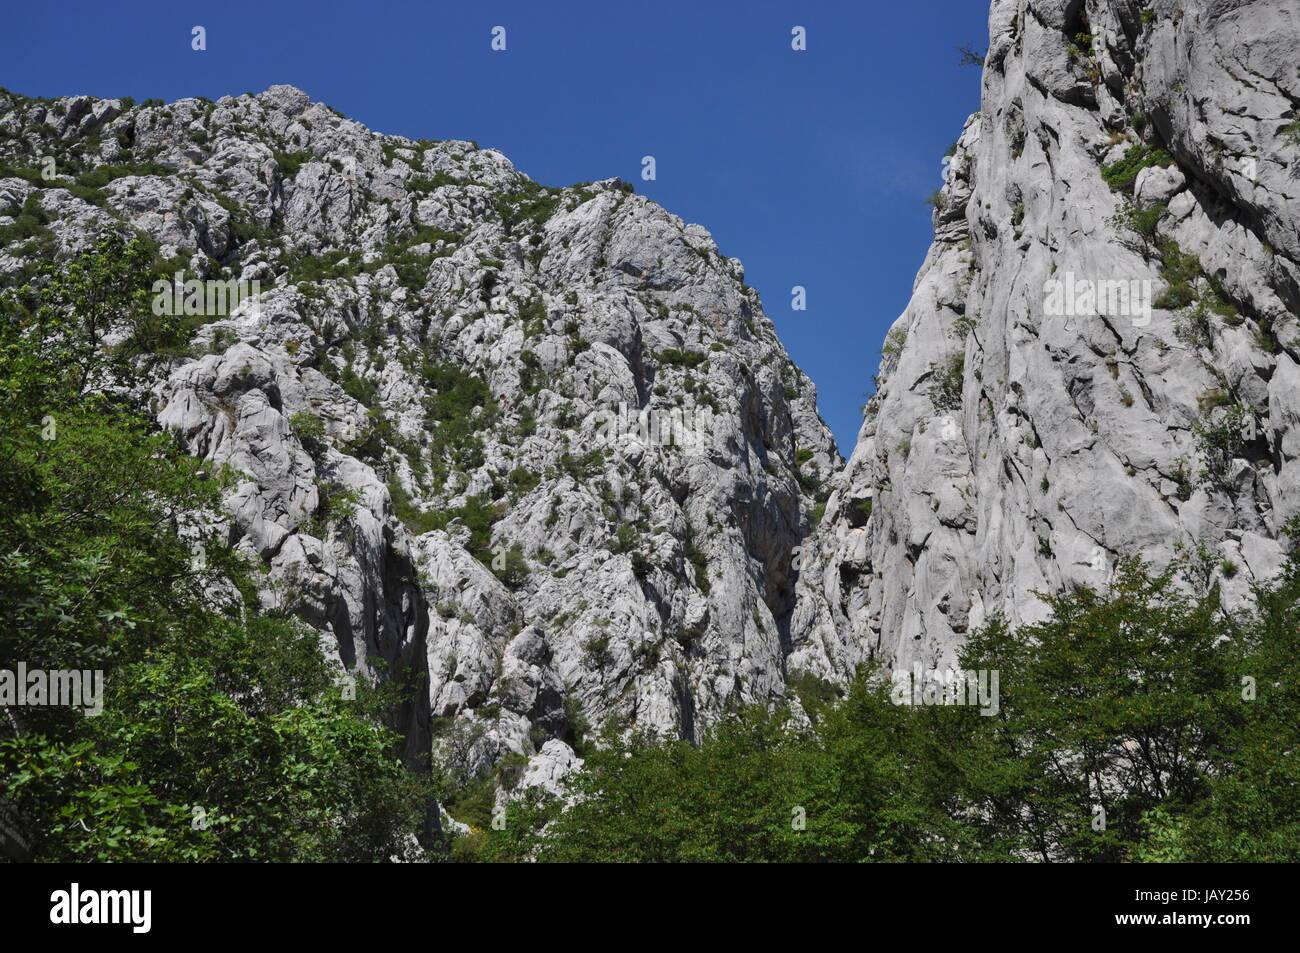 Paklenica-Schlucht, kroatien, schlucht, klamm, canyon, paklenica, berg, felsen, fels, kletterfels, kletterfelsen, - Stock Image